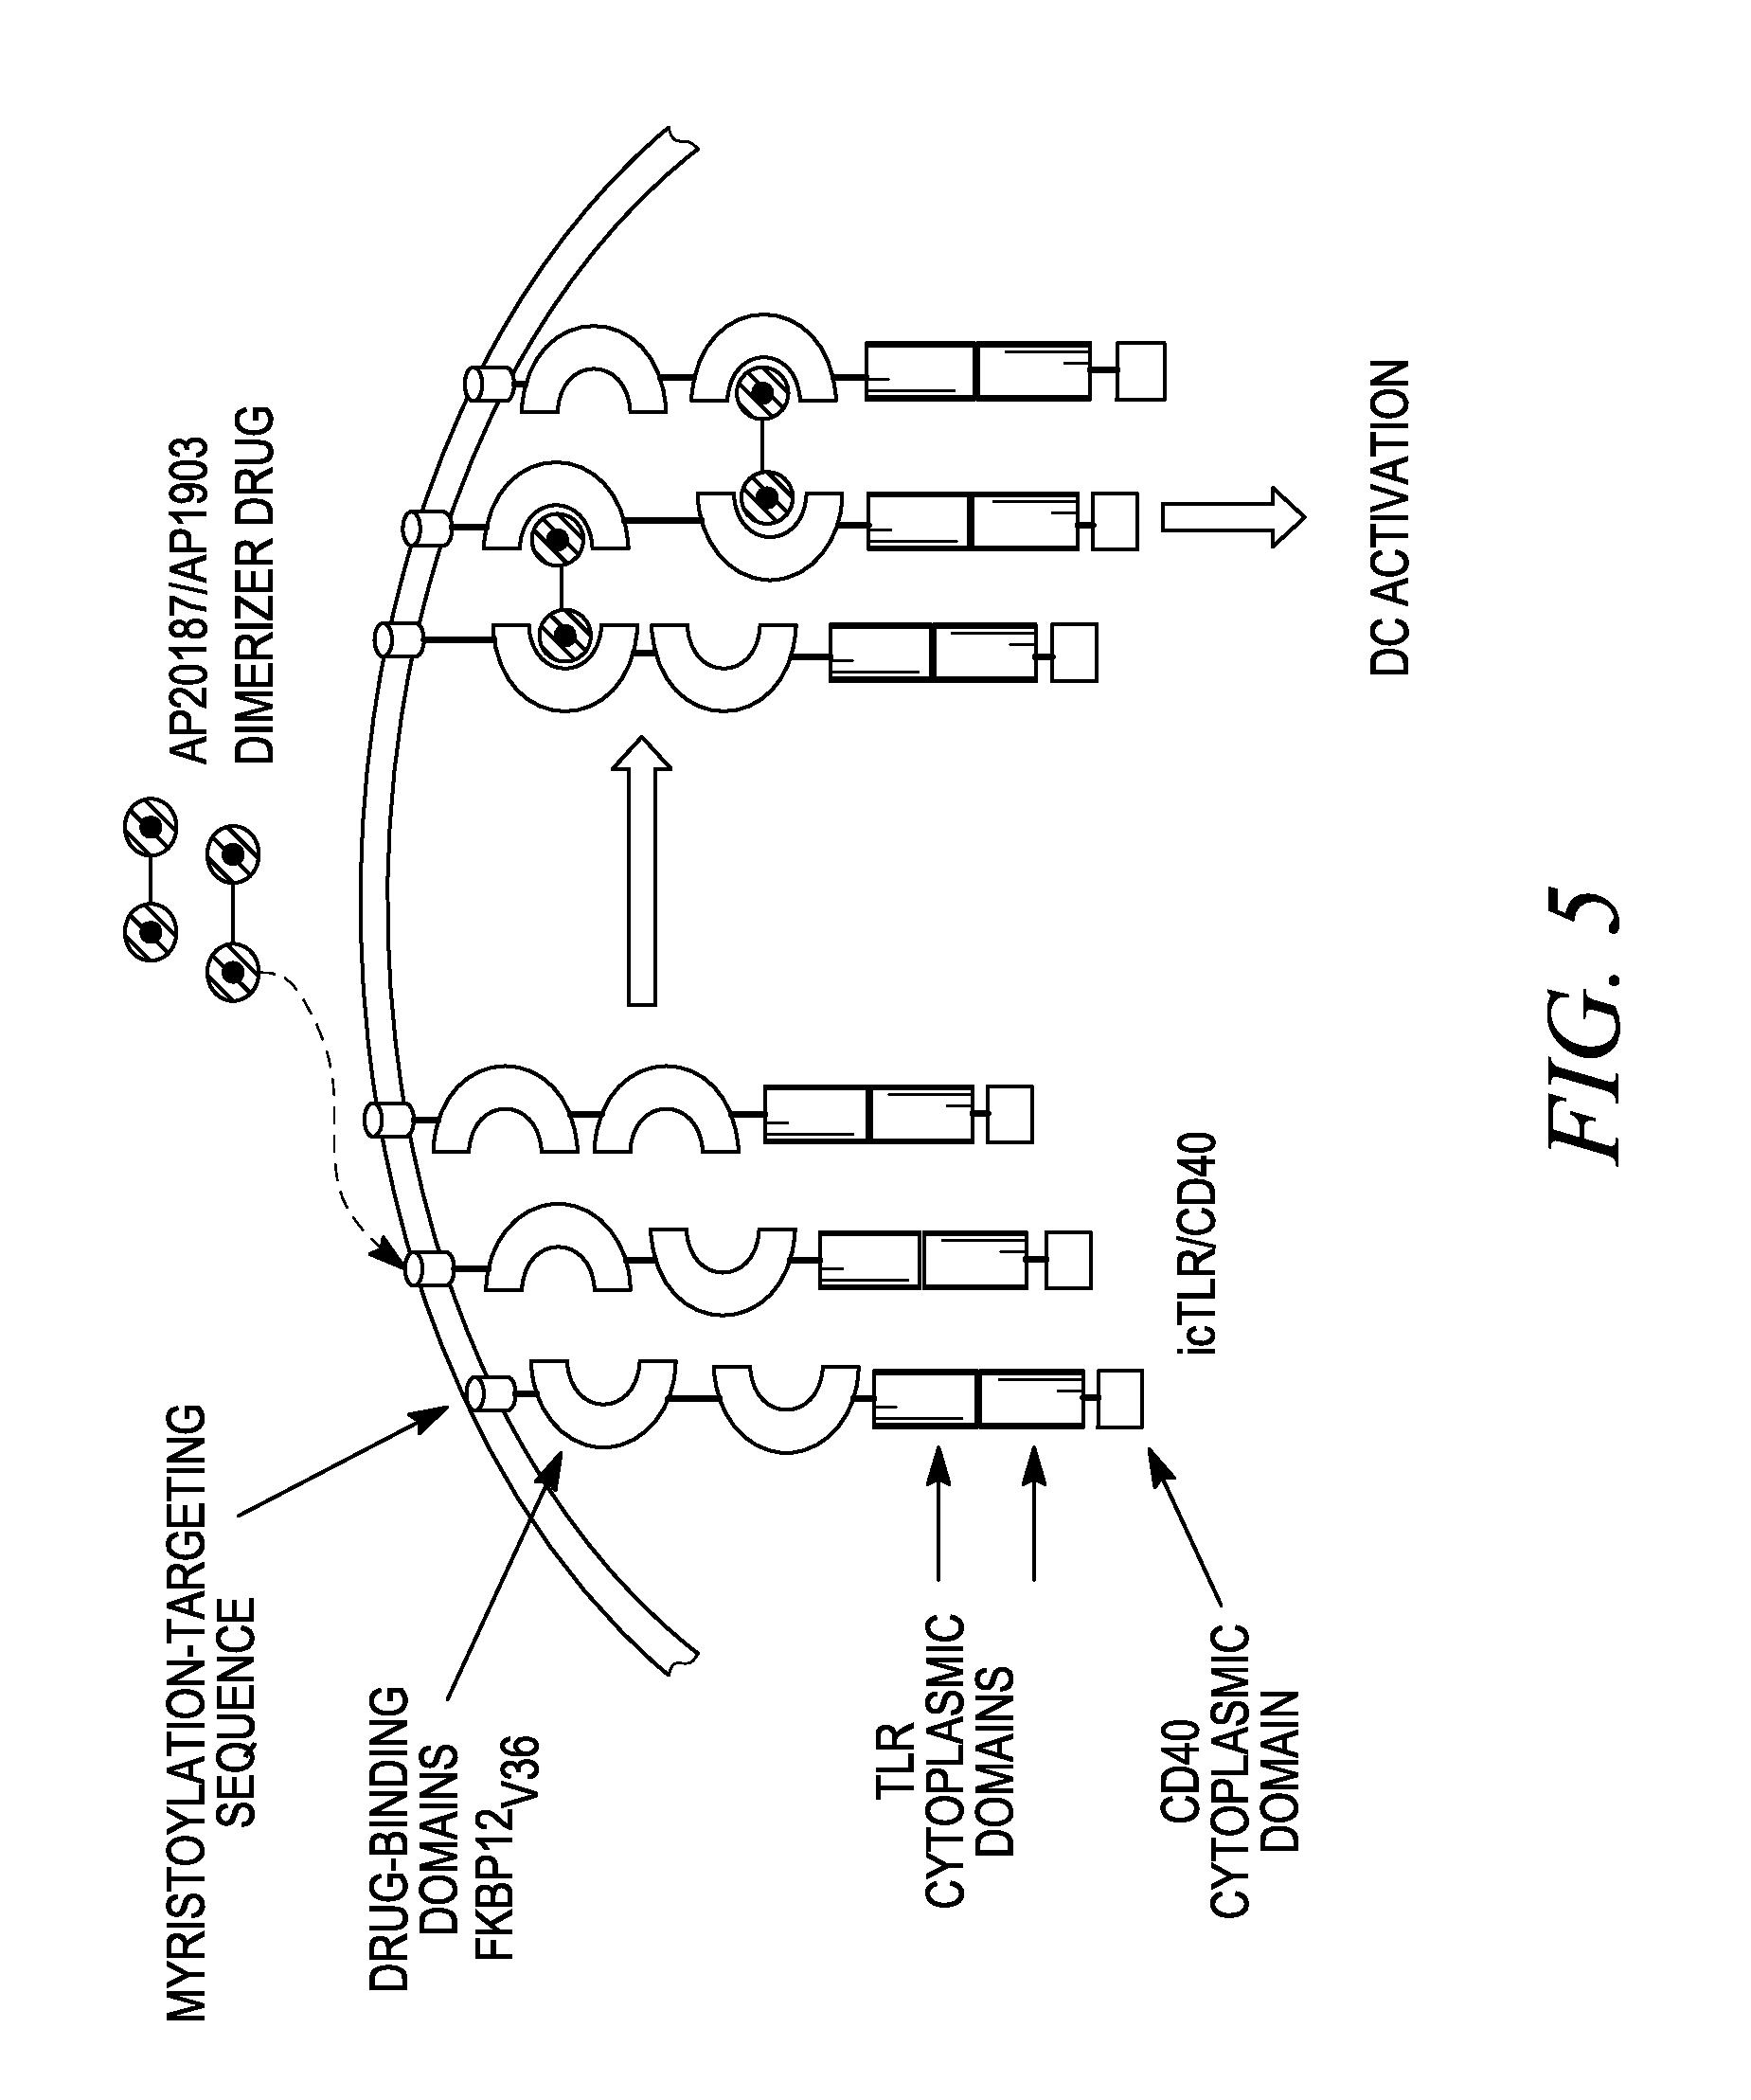 toyota tundra speaker wiring diagram a breaker box audio html imageresizertool com